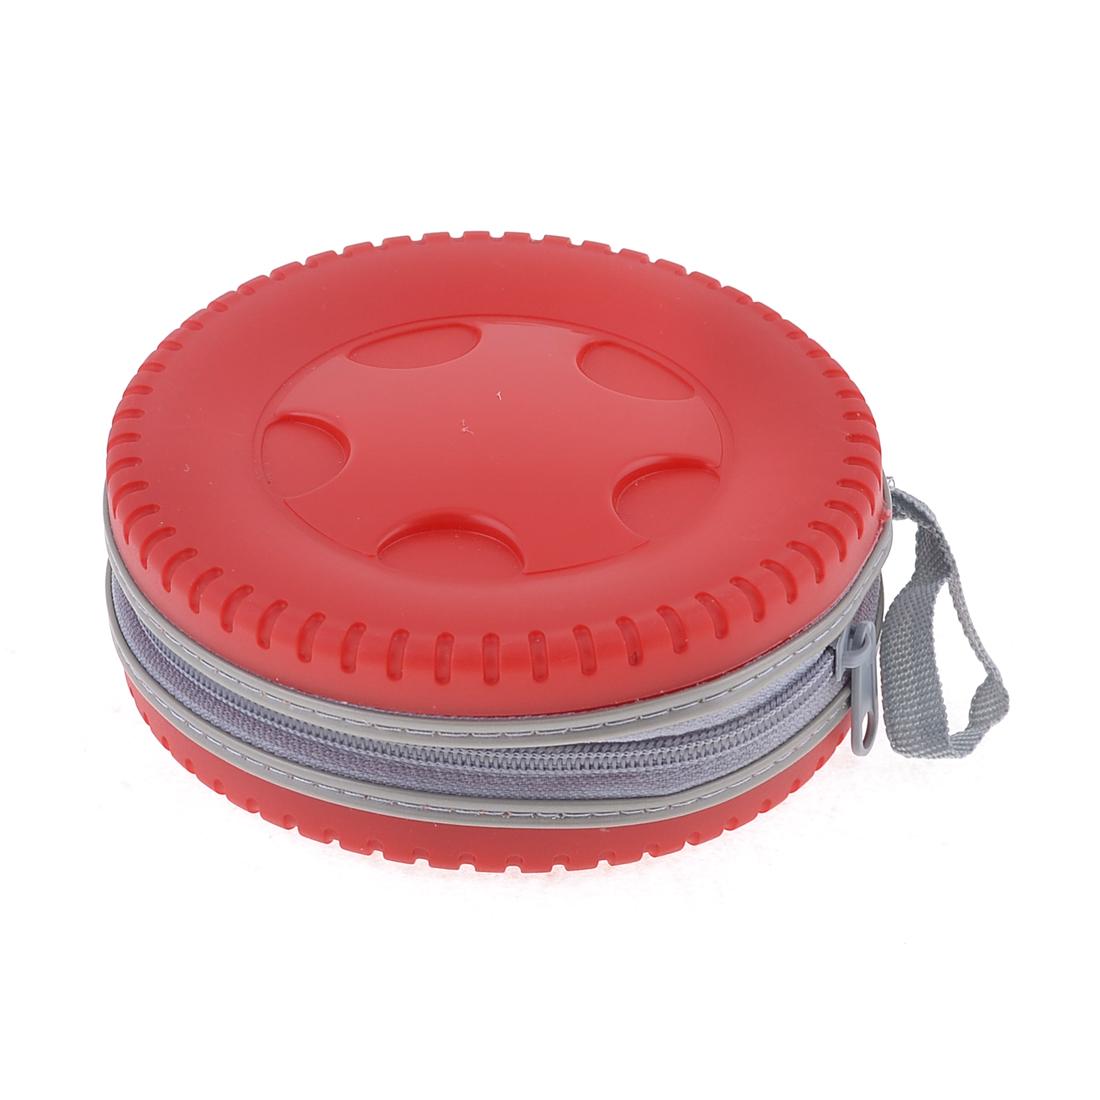 Household Tire Design Zippered 20 DVD CD Discs Holder Pocket Storage Bag Red